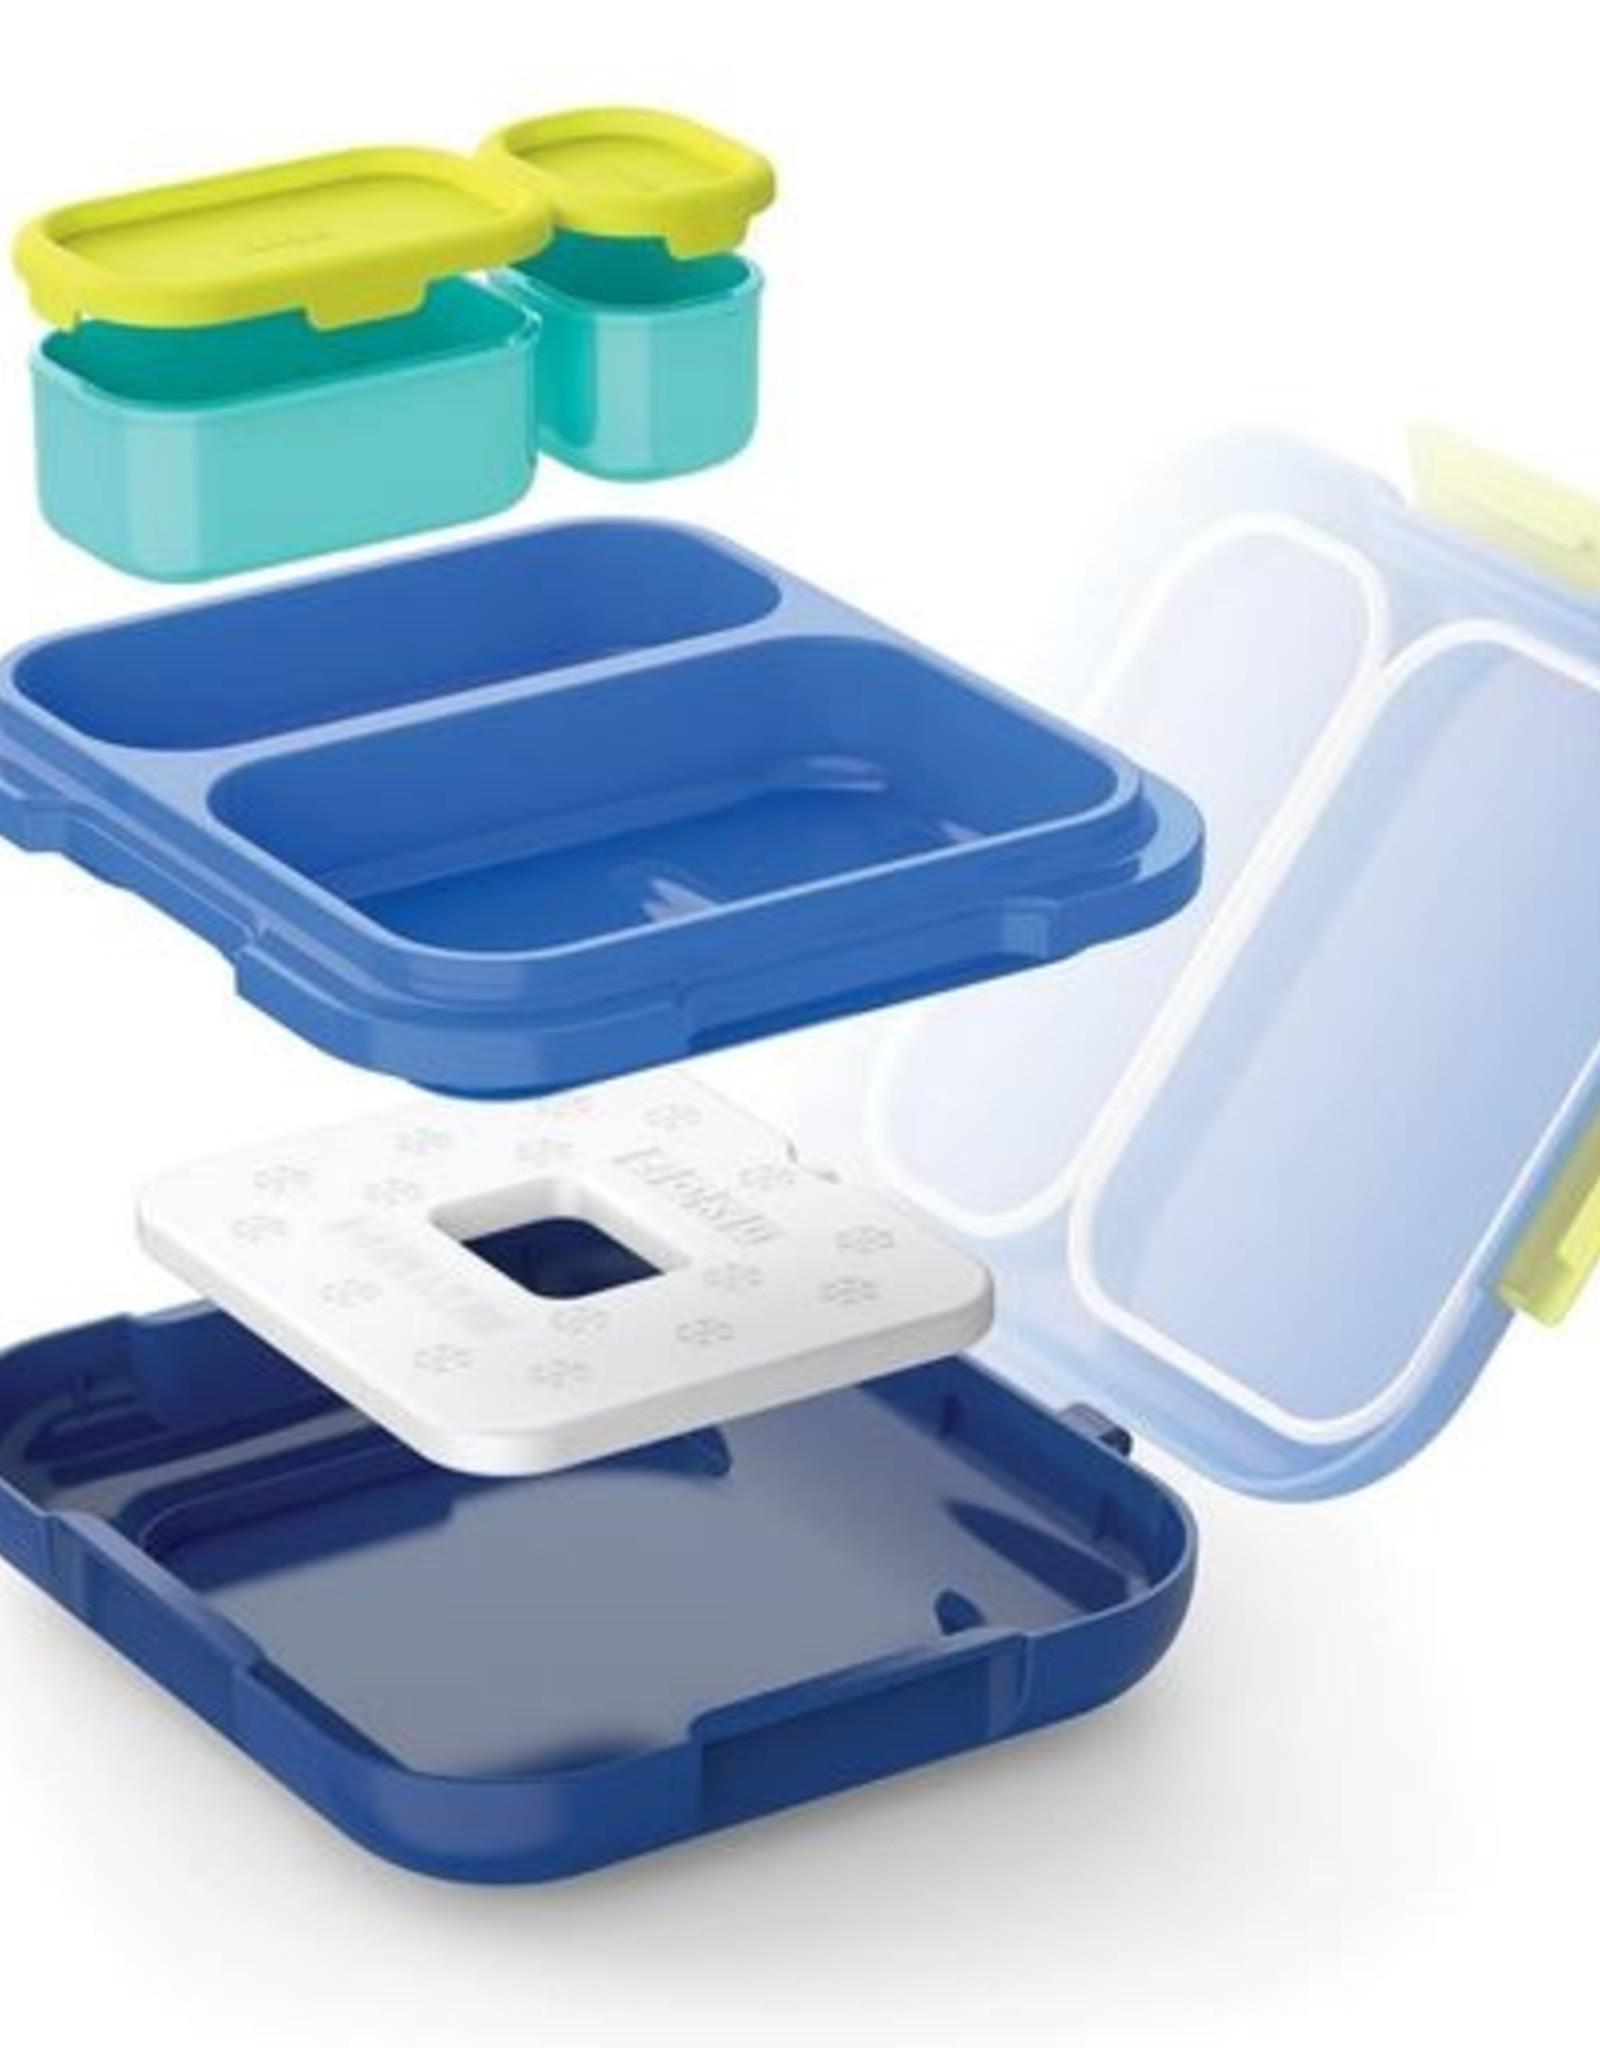 Zoku Neat bento lunchbox - Paars/Roze